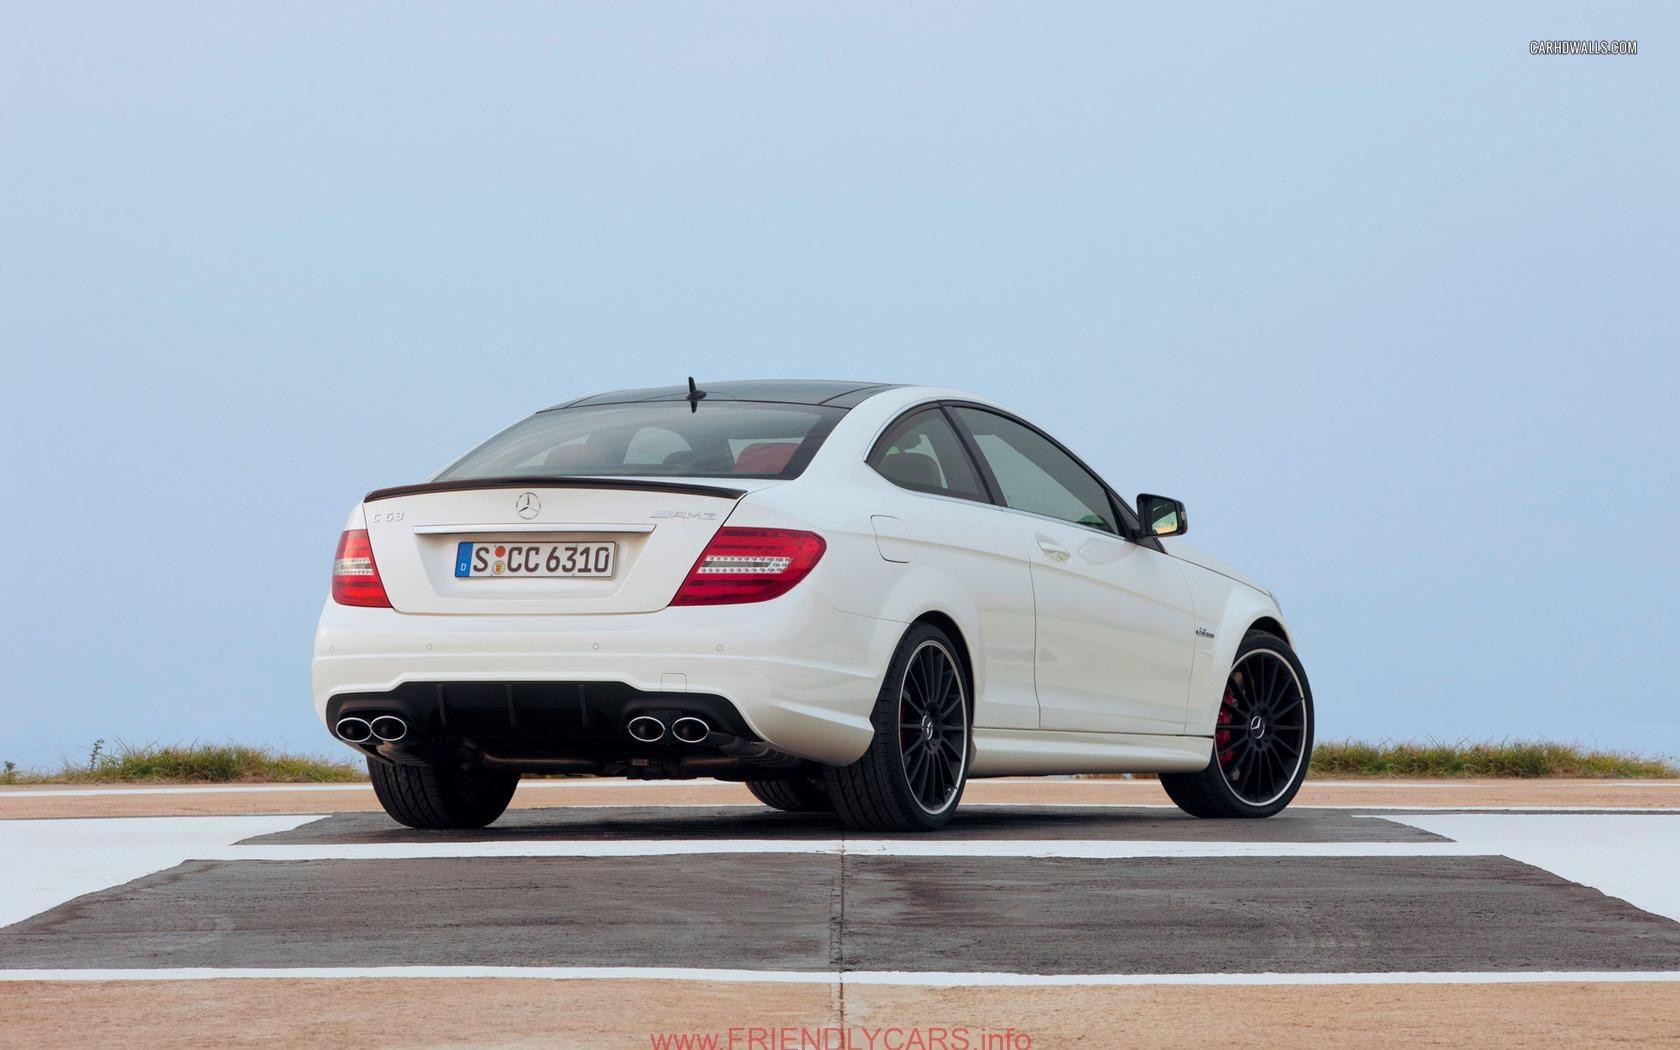 Mercedes C Class Coupe White Car Images Hd Alifiah Sites Mercedes C Class Coupe Mercedes Benz Cars Benz C